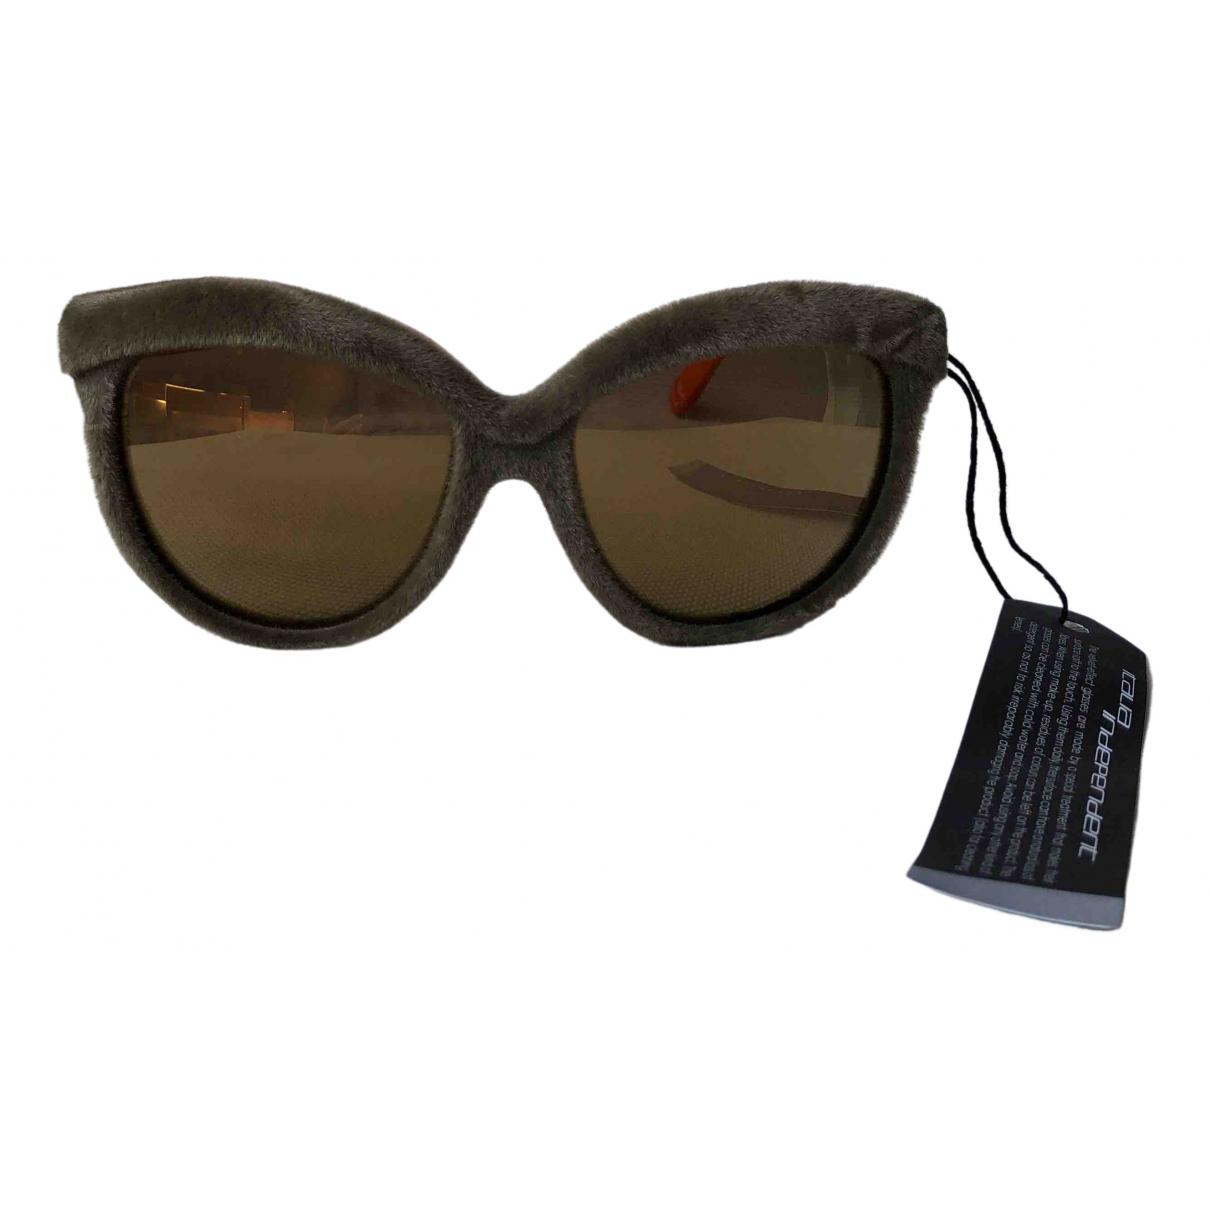 Gafas oversize Chiara Ferragni